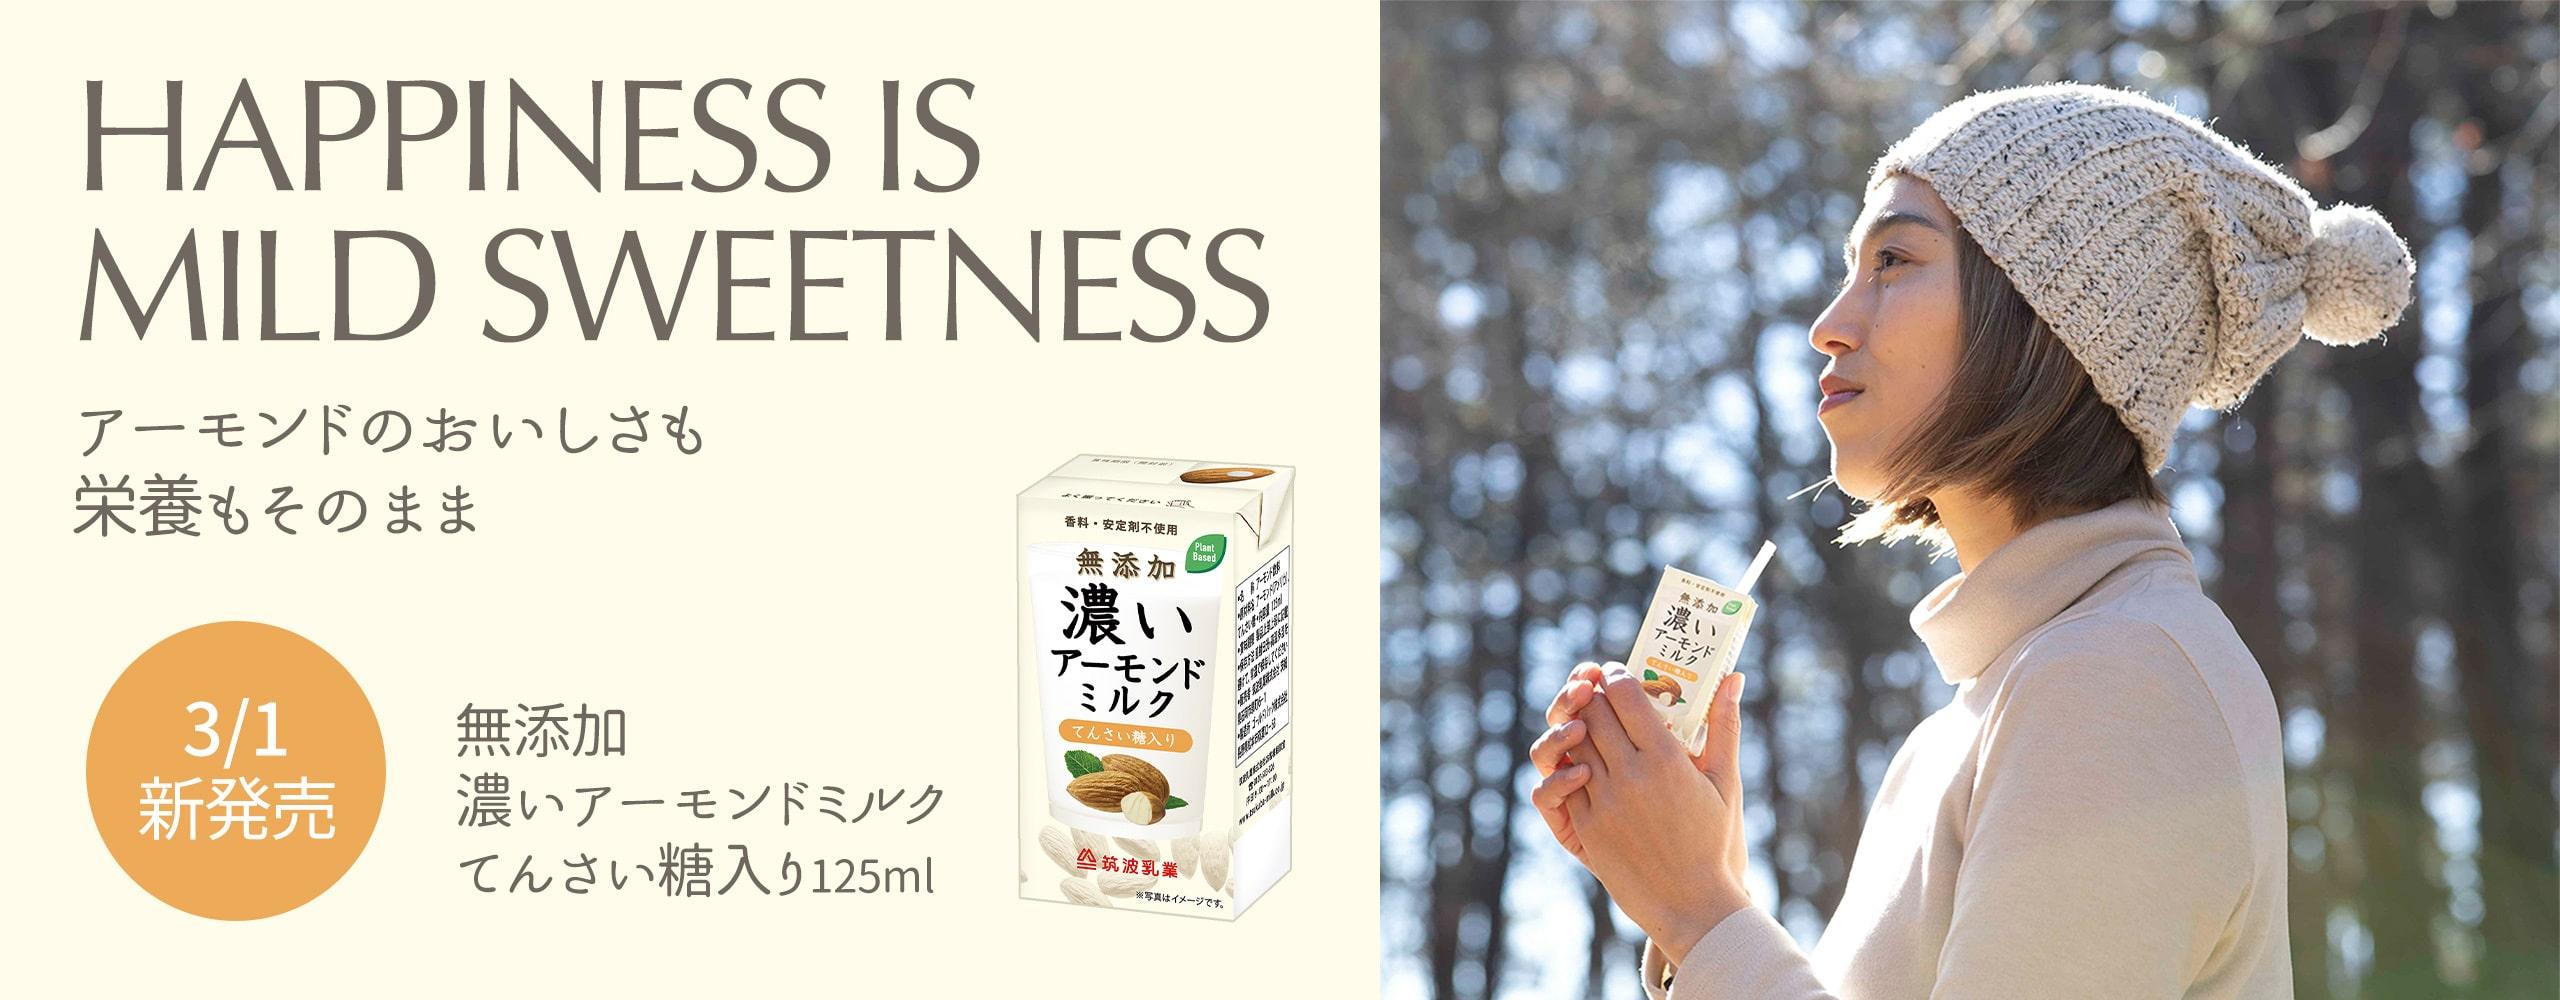 HAPPINESS IS GENTLE SWEETNESS 3/1 新発売 無添加 濃いアーモンドミルク てんさい糖入り 125ml